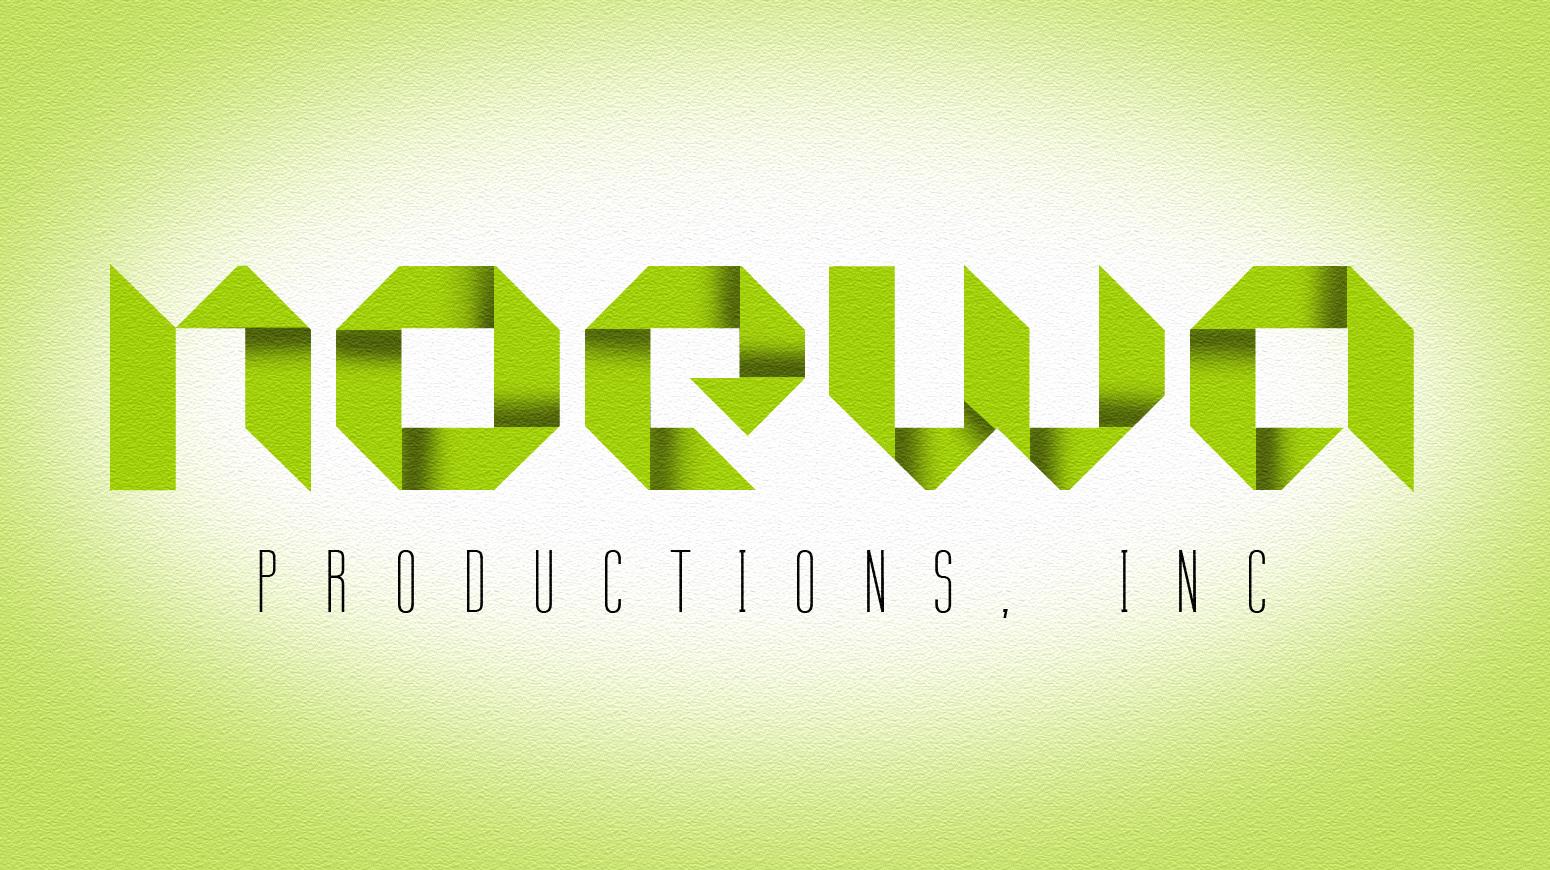 NOEWA-Origami-text-logo